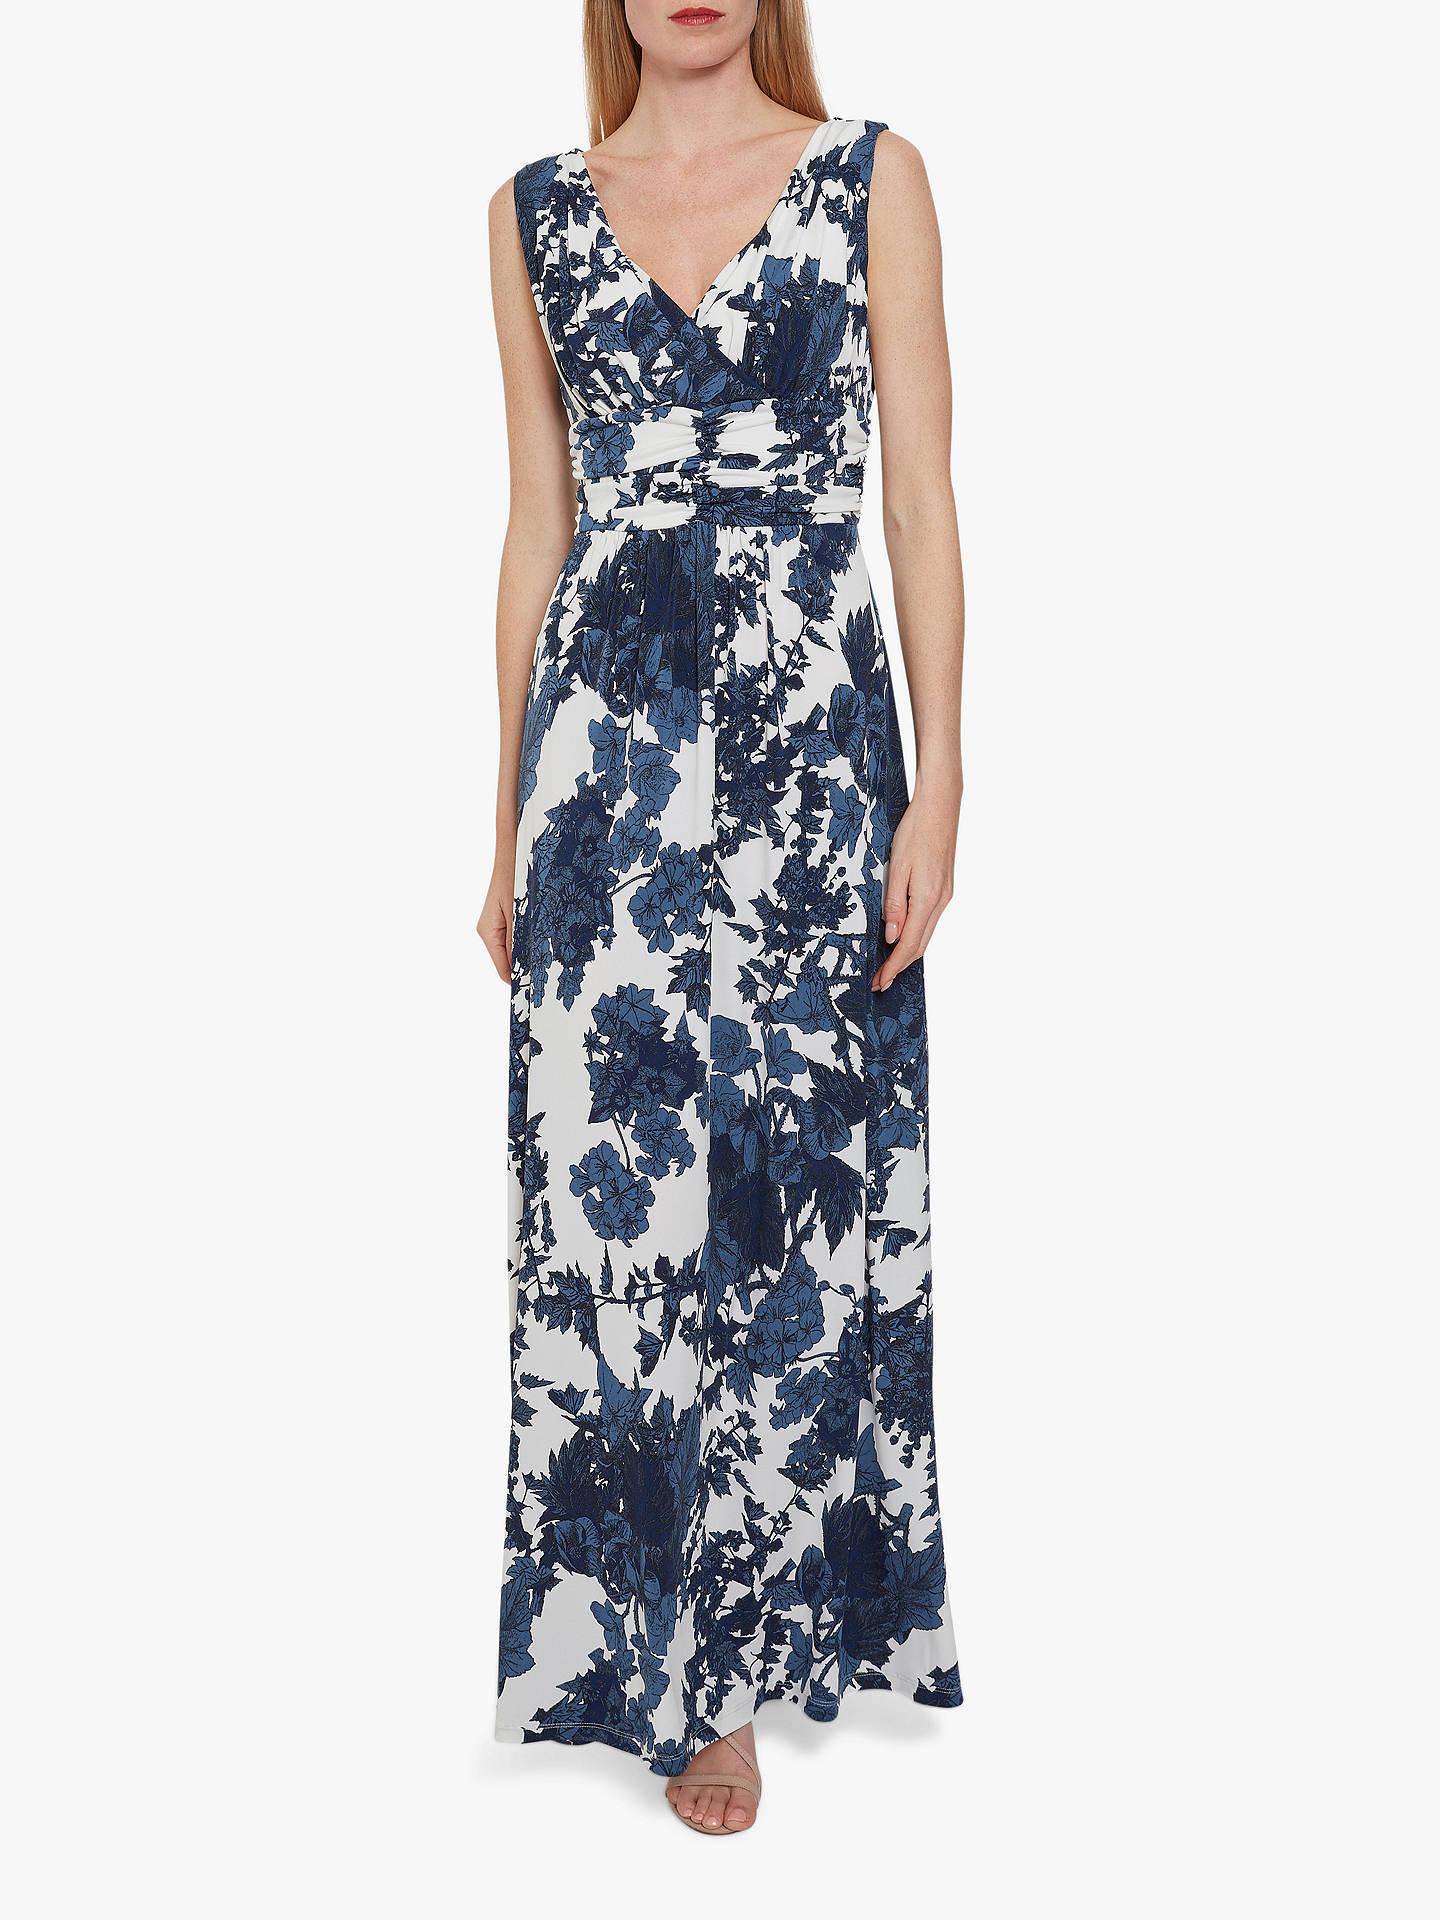 b786350e21e35 Gina Bacconi Maliana Floral Print Jersey Maxi Dress, Navy